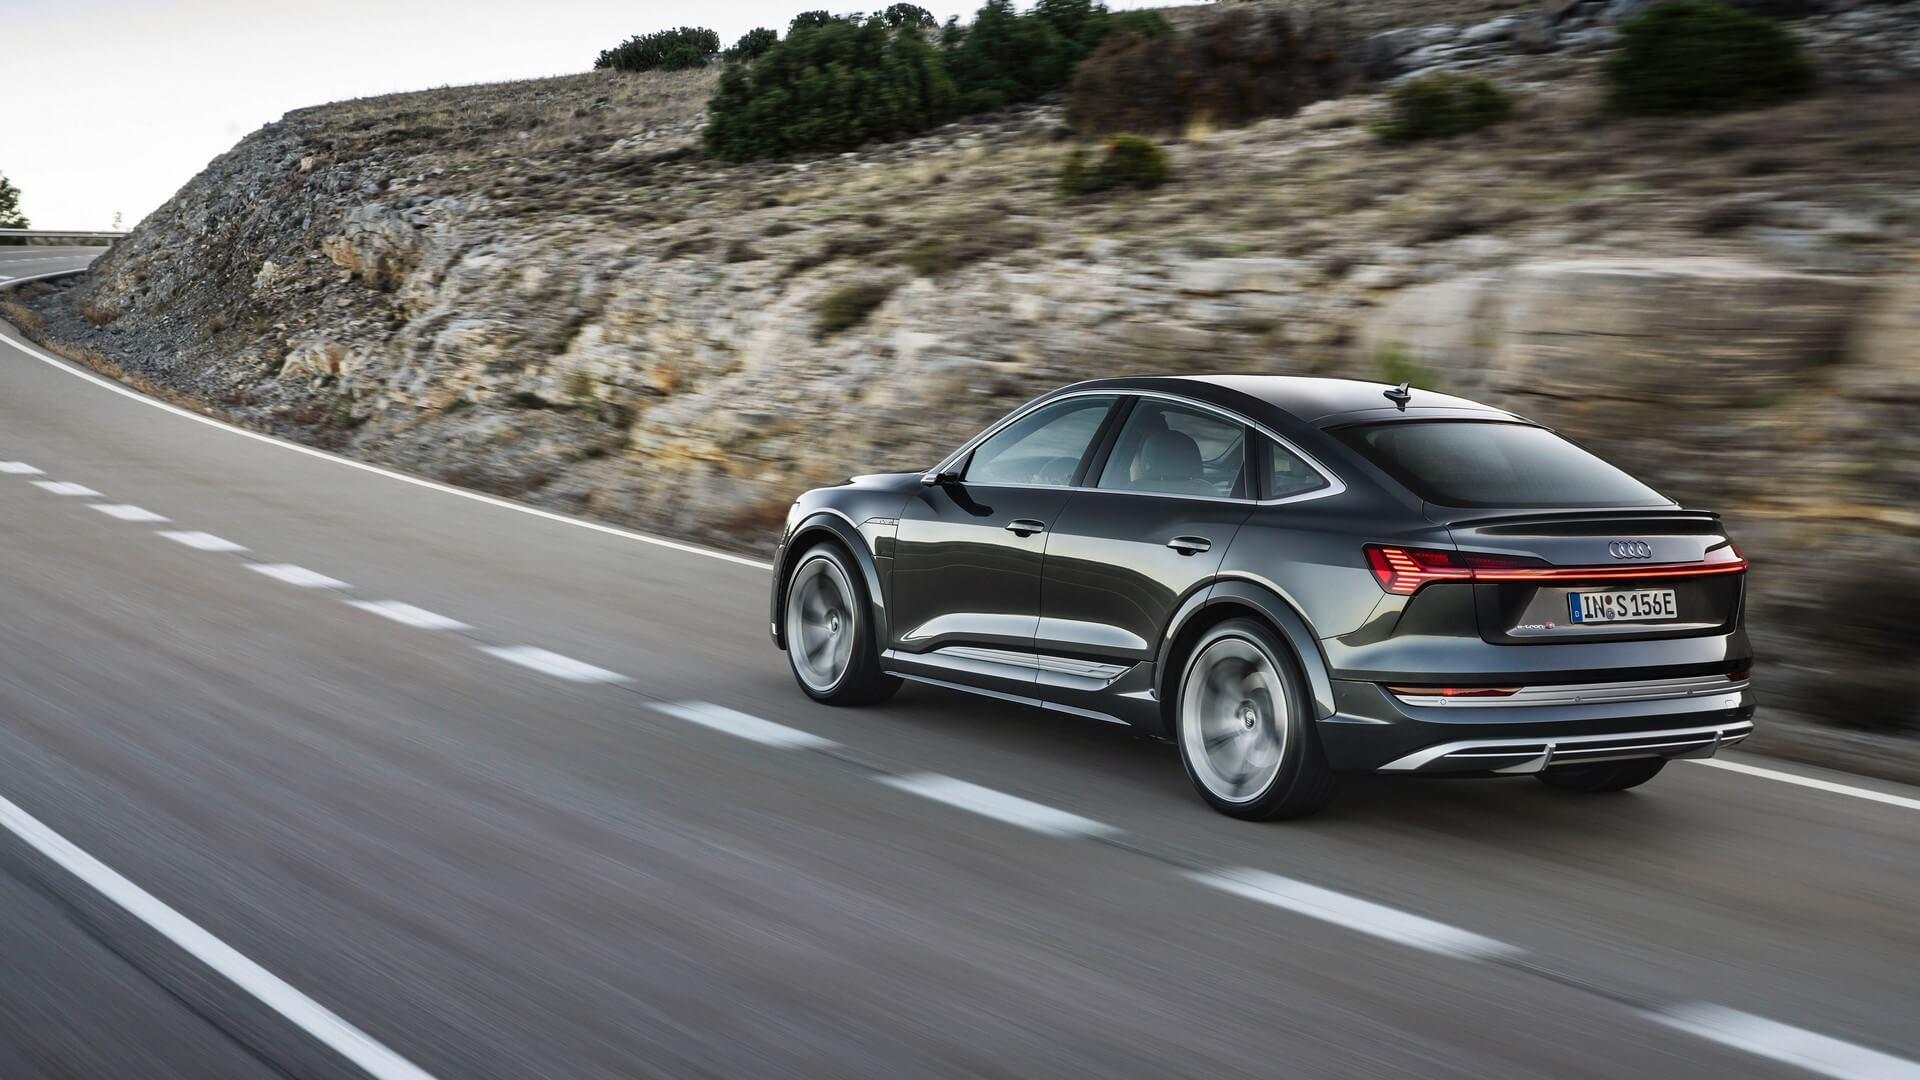 Audi-E-Tron-S-and-E-Tron-S-Sportback-2020-51